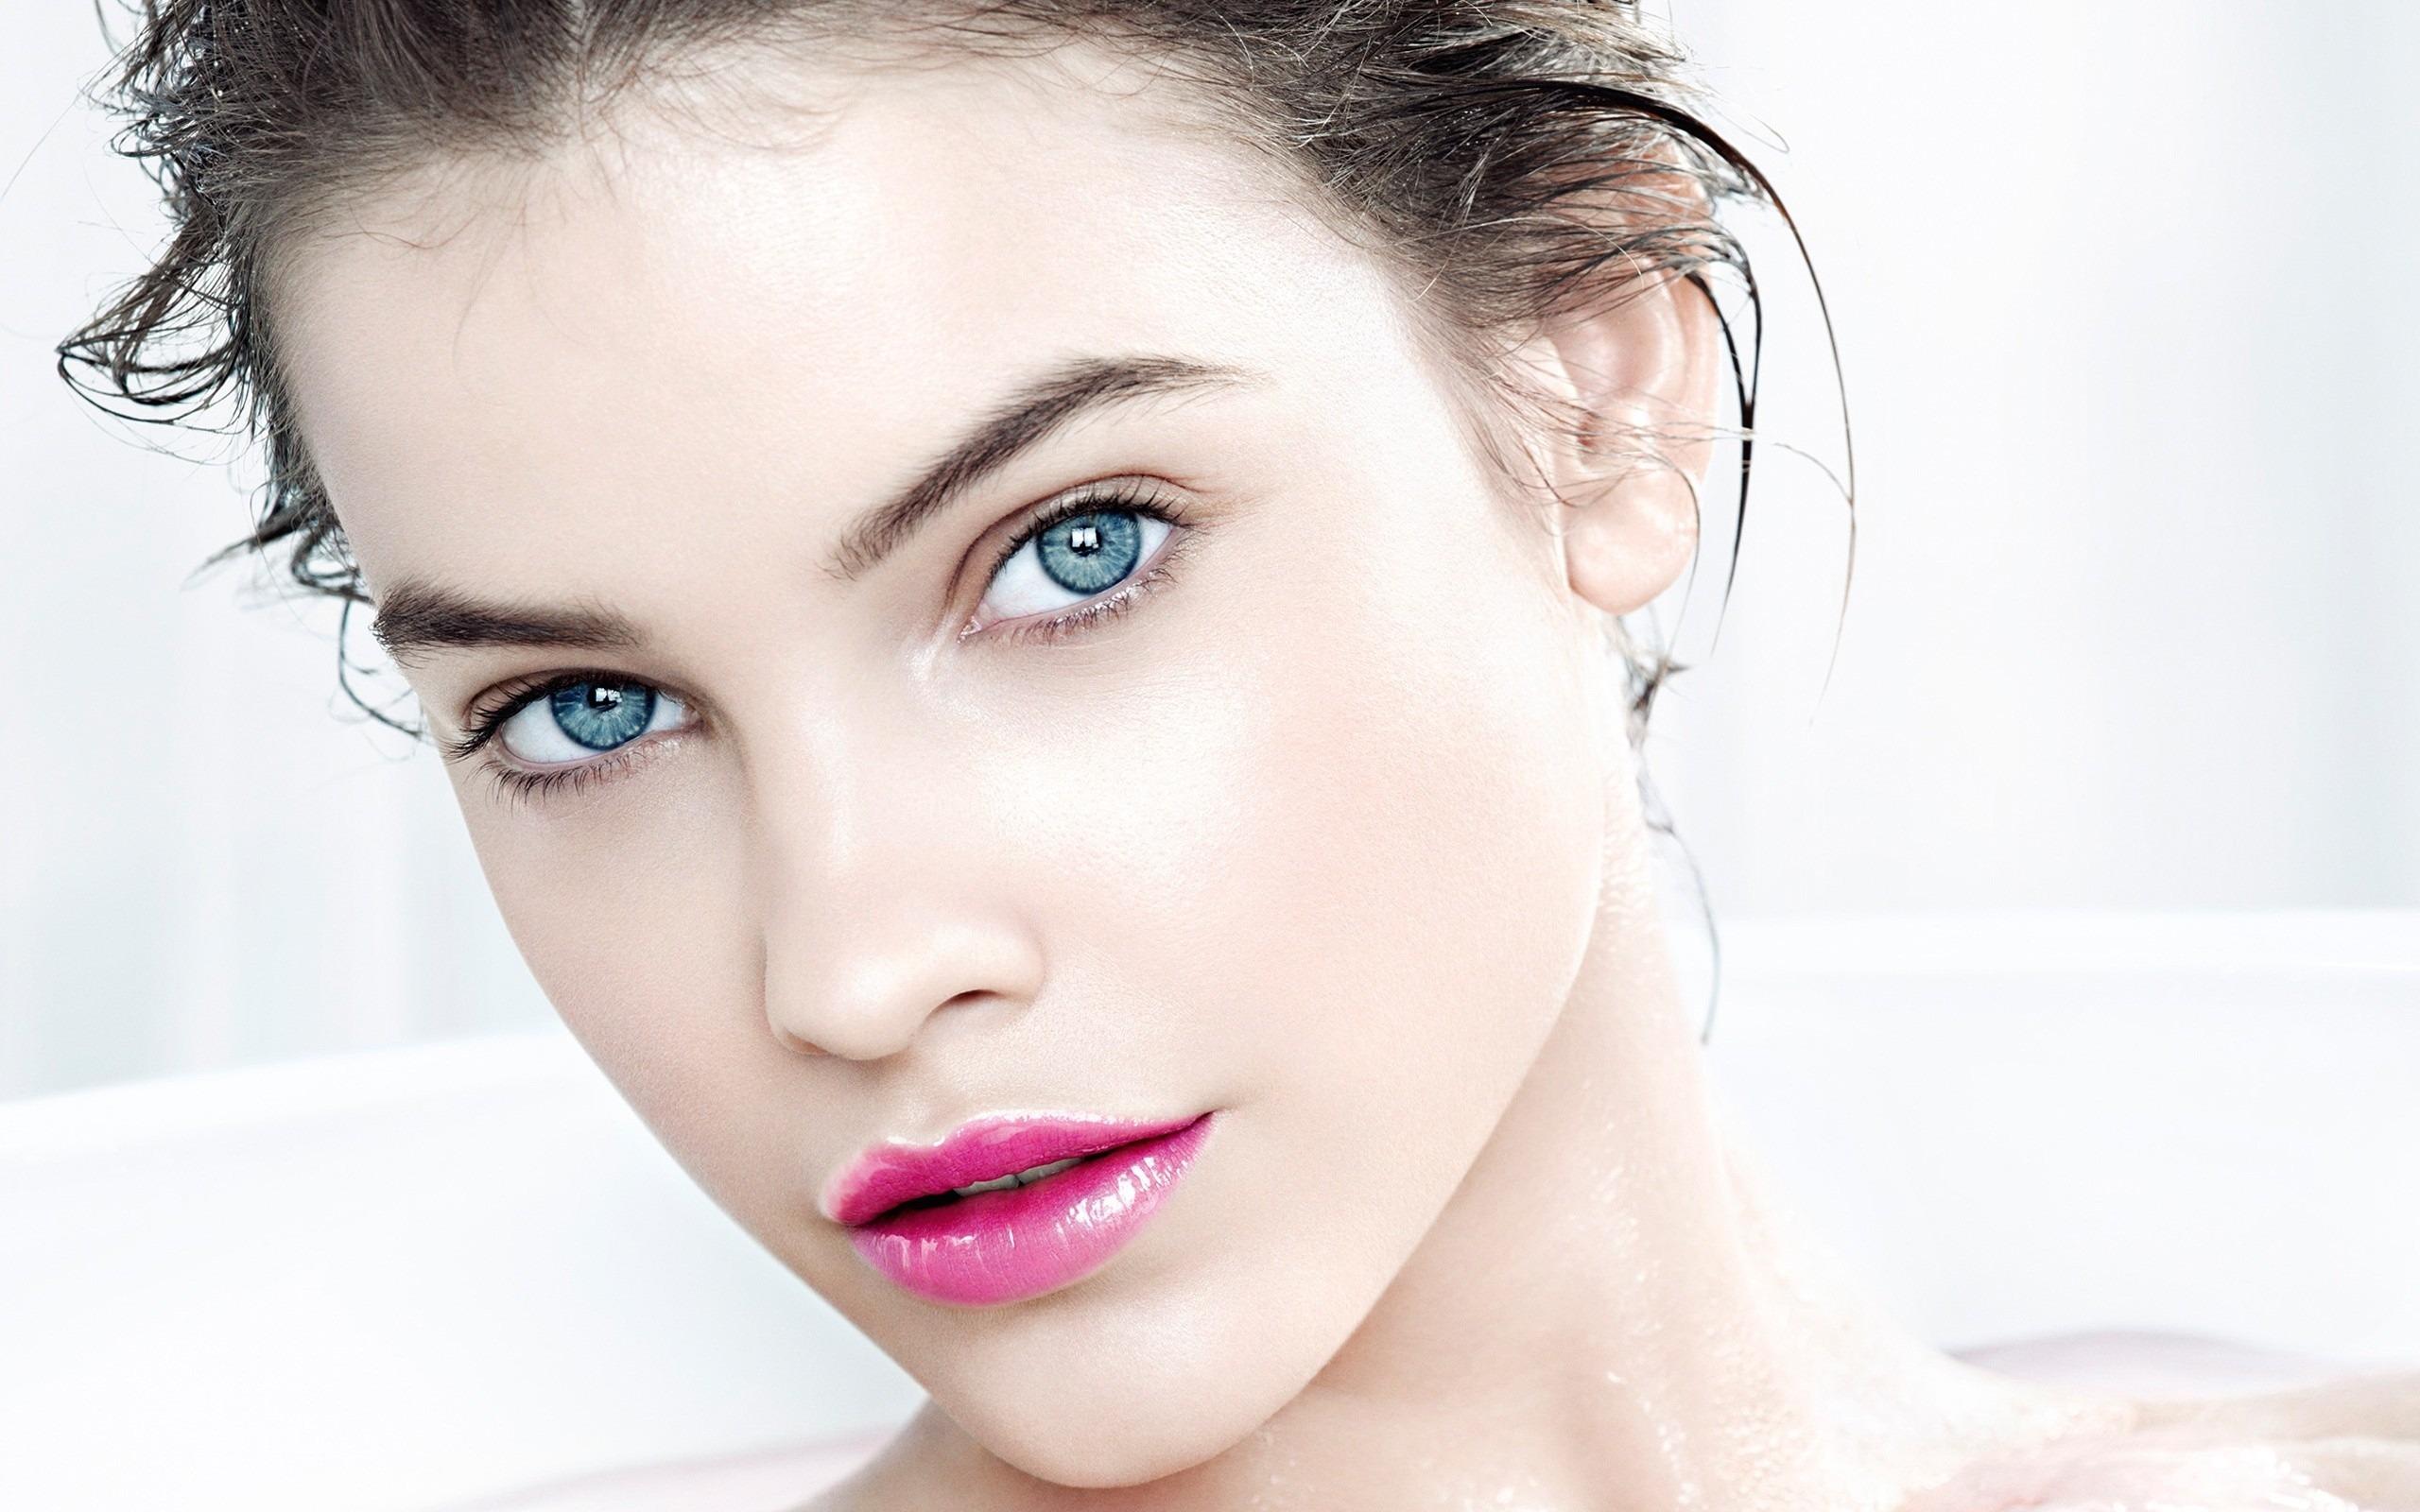 Barbara Palvin Model Makeup Beauty Photo Hd Wallpaper Preview 10wallpaper Com